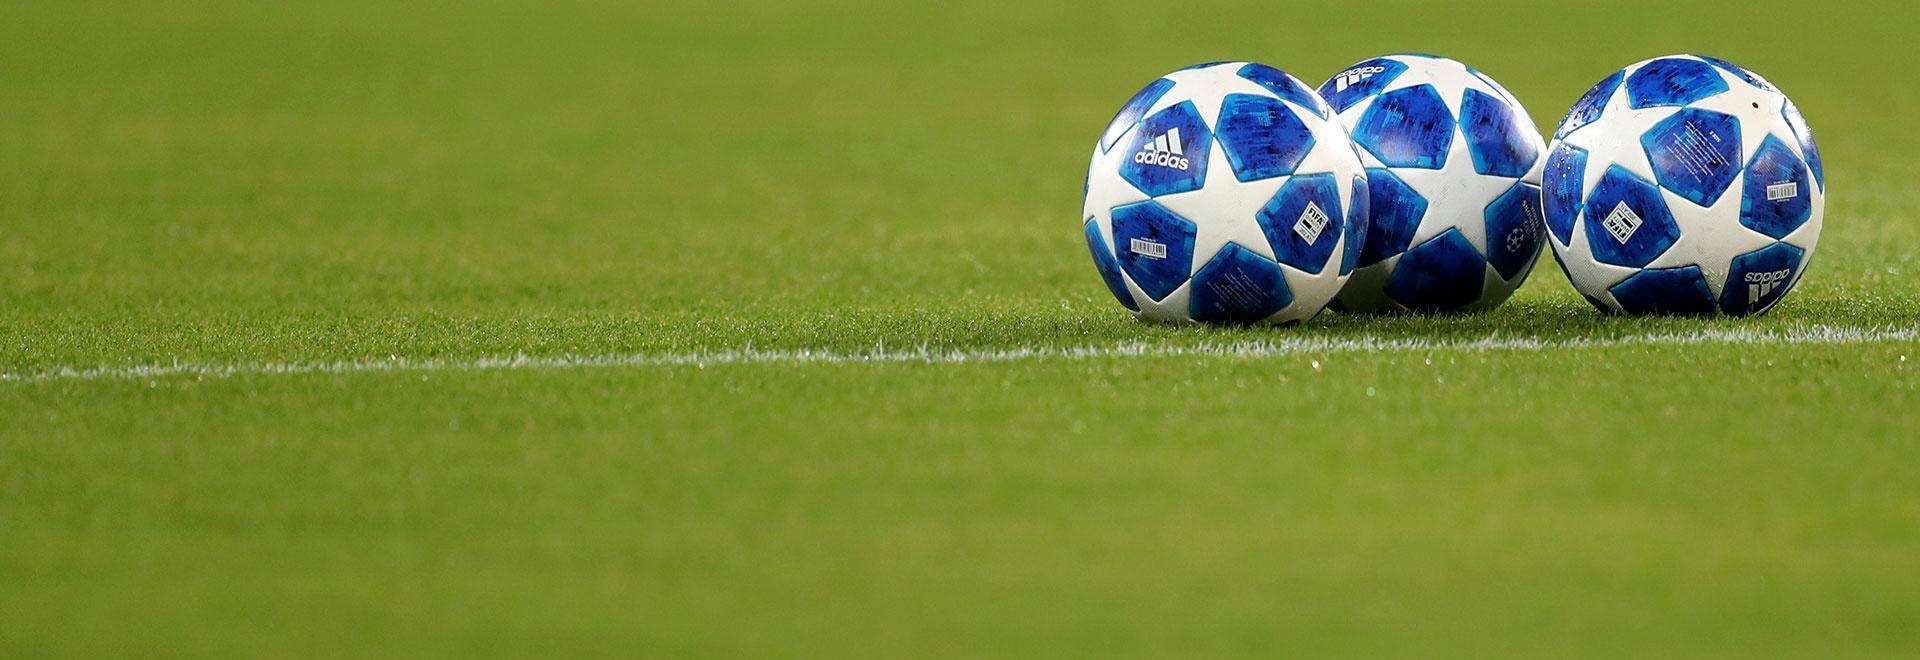 PSG - Napoli 24/10/18. 3a g.